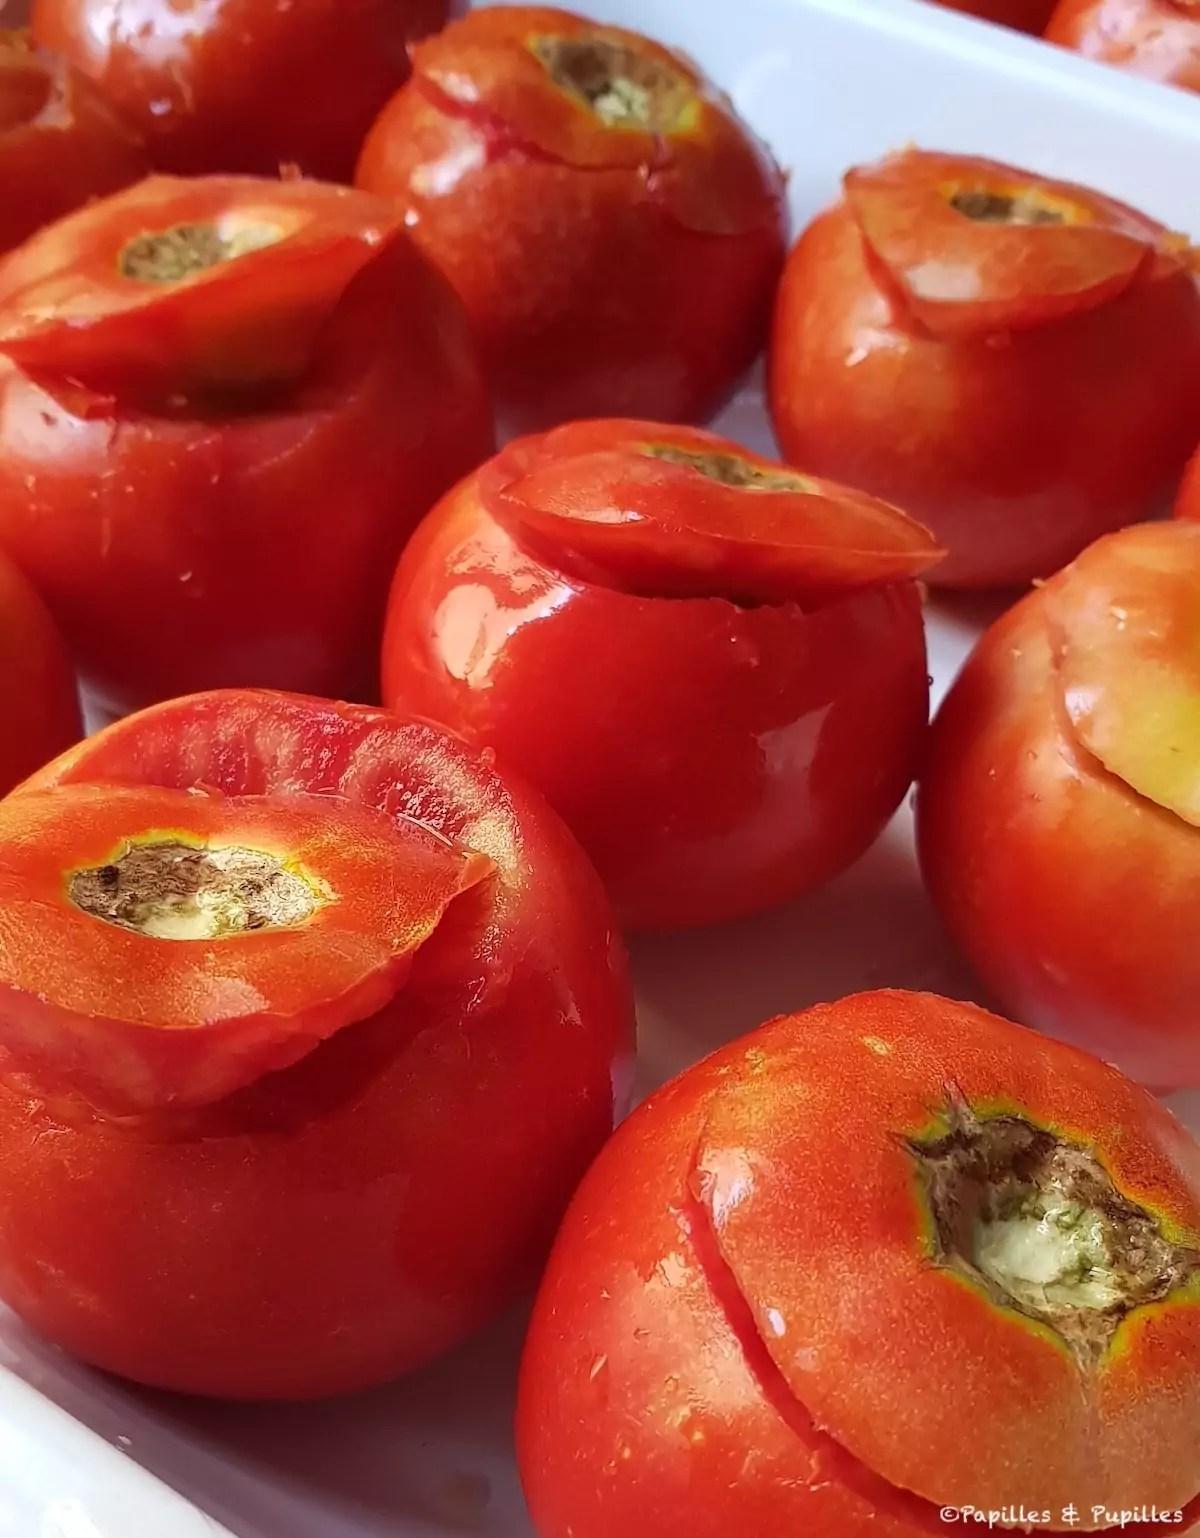 Congeler Des Tomates Farcies : congeler, tomates, farcies, Recette, Tomates, Farcies